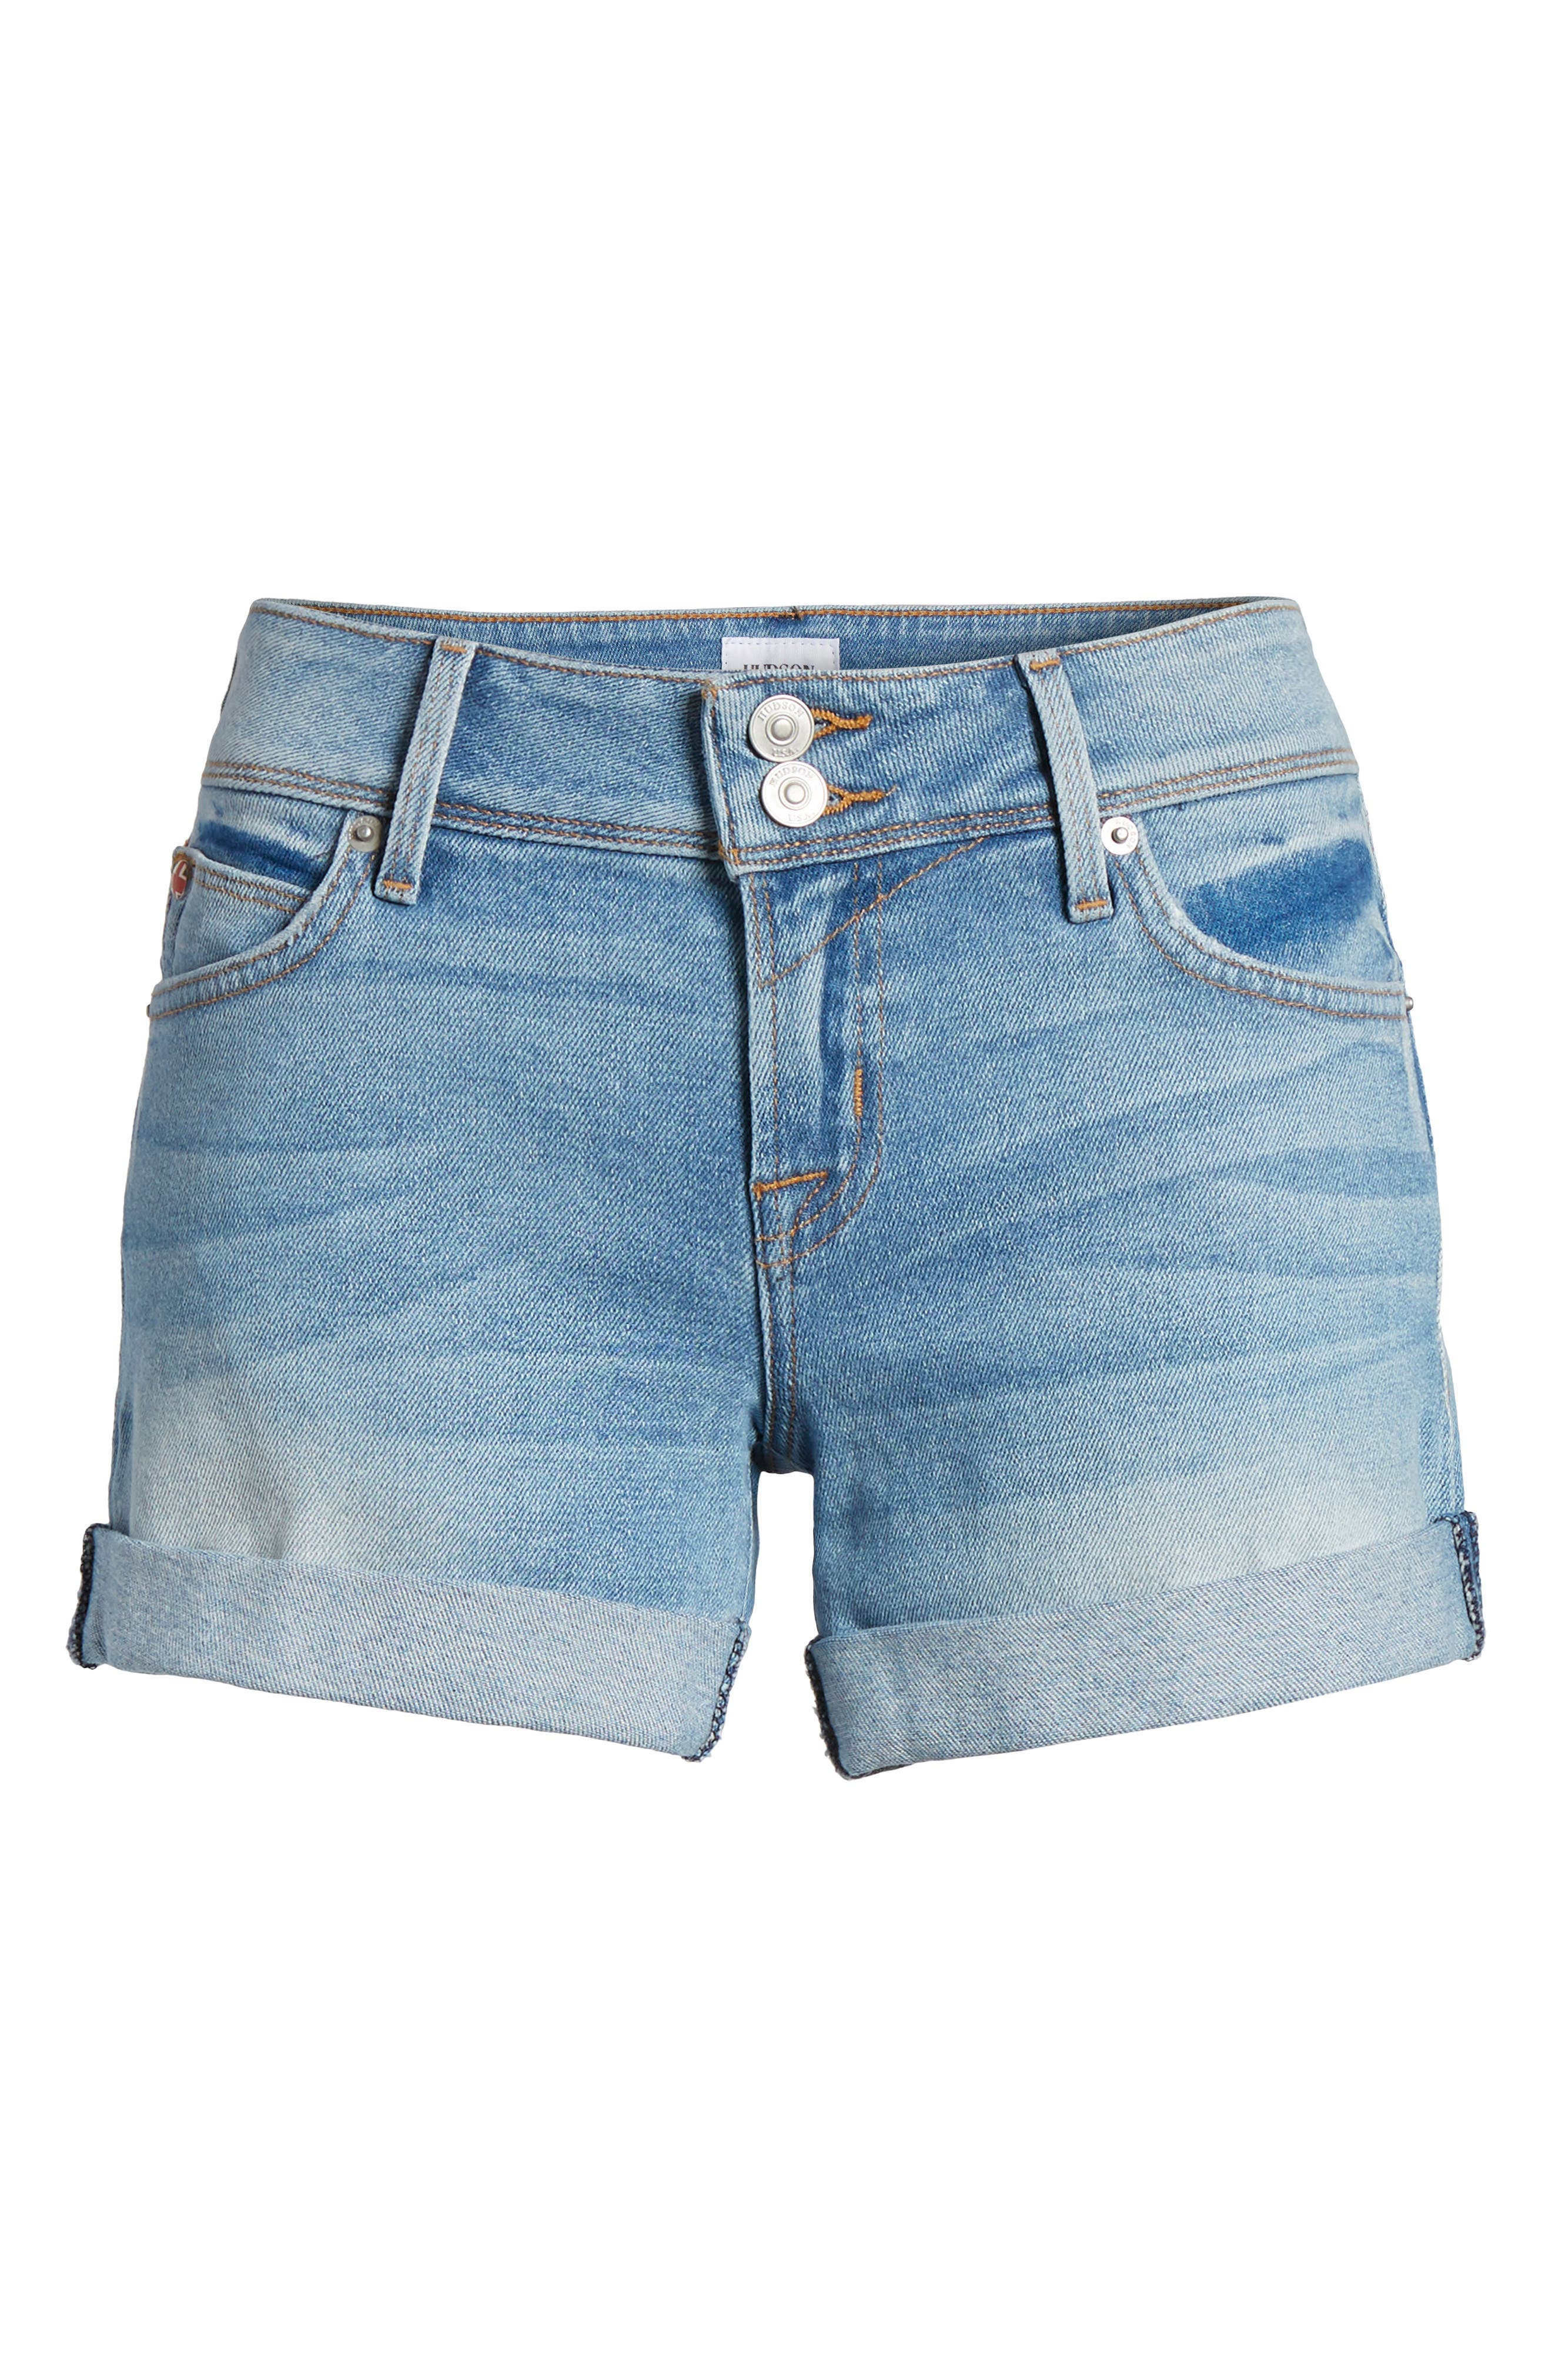 HUDSON JEANS,                             Croxley Cuff Denim Shorts,                             Alternate thumbnail 6, color,                             425